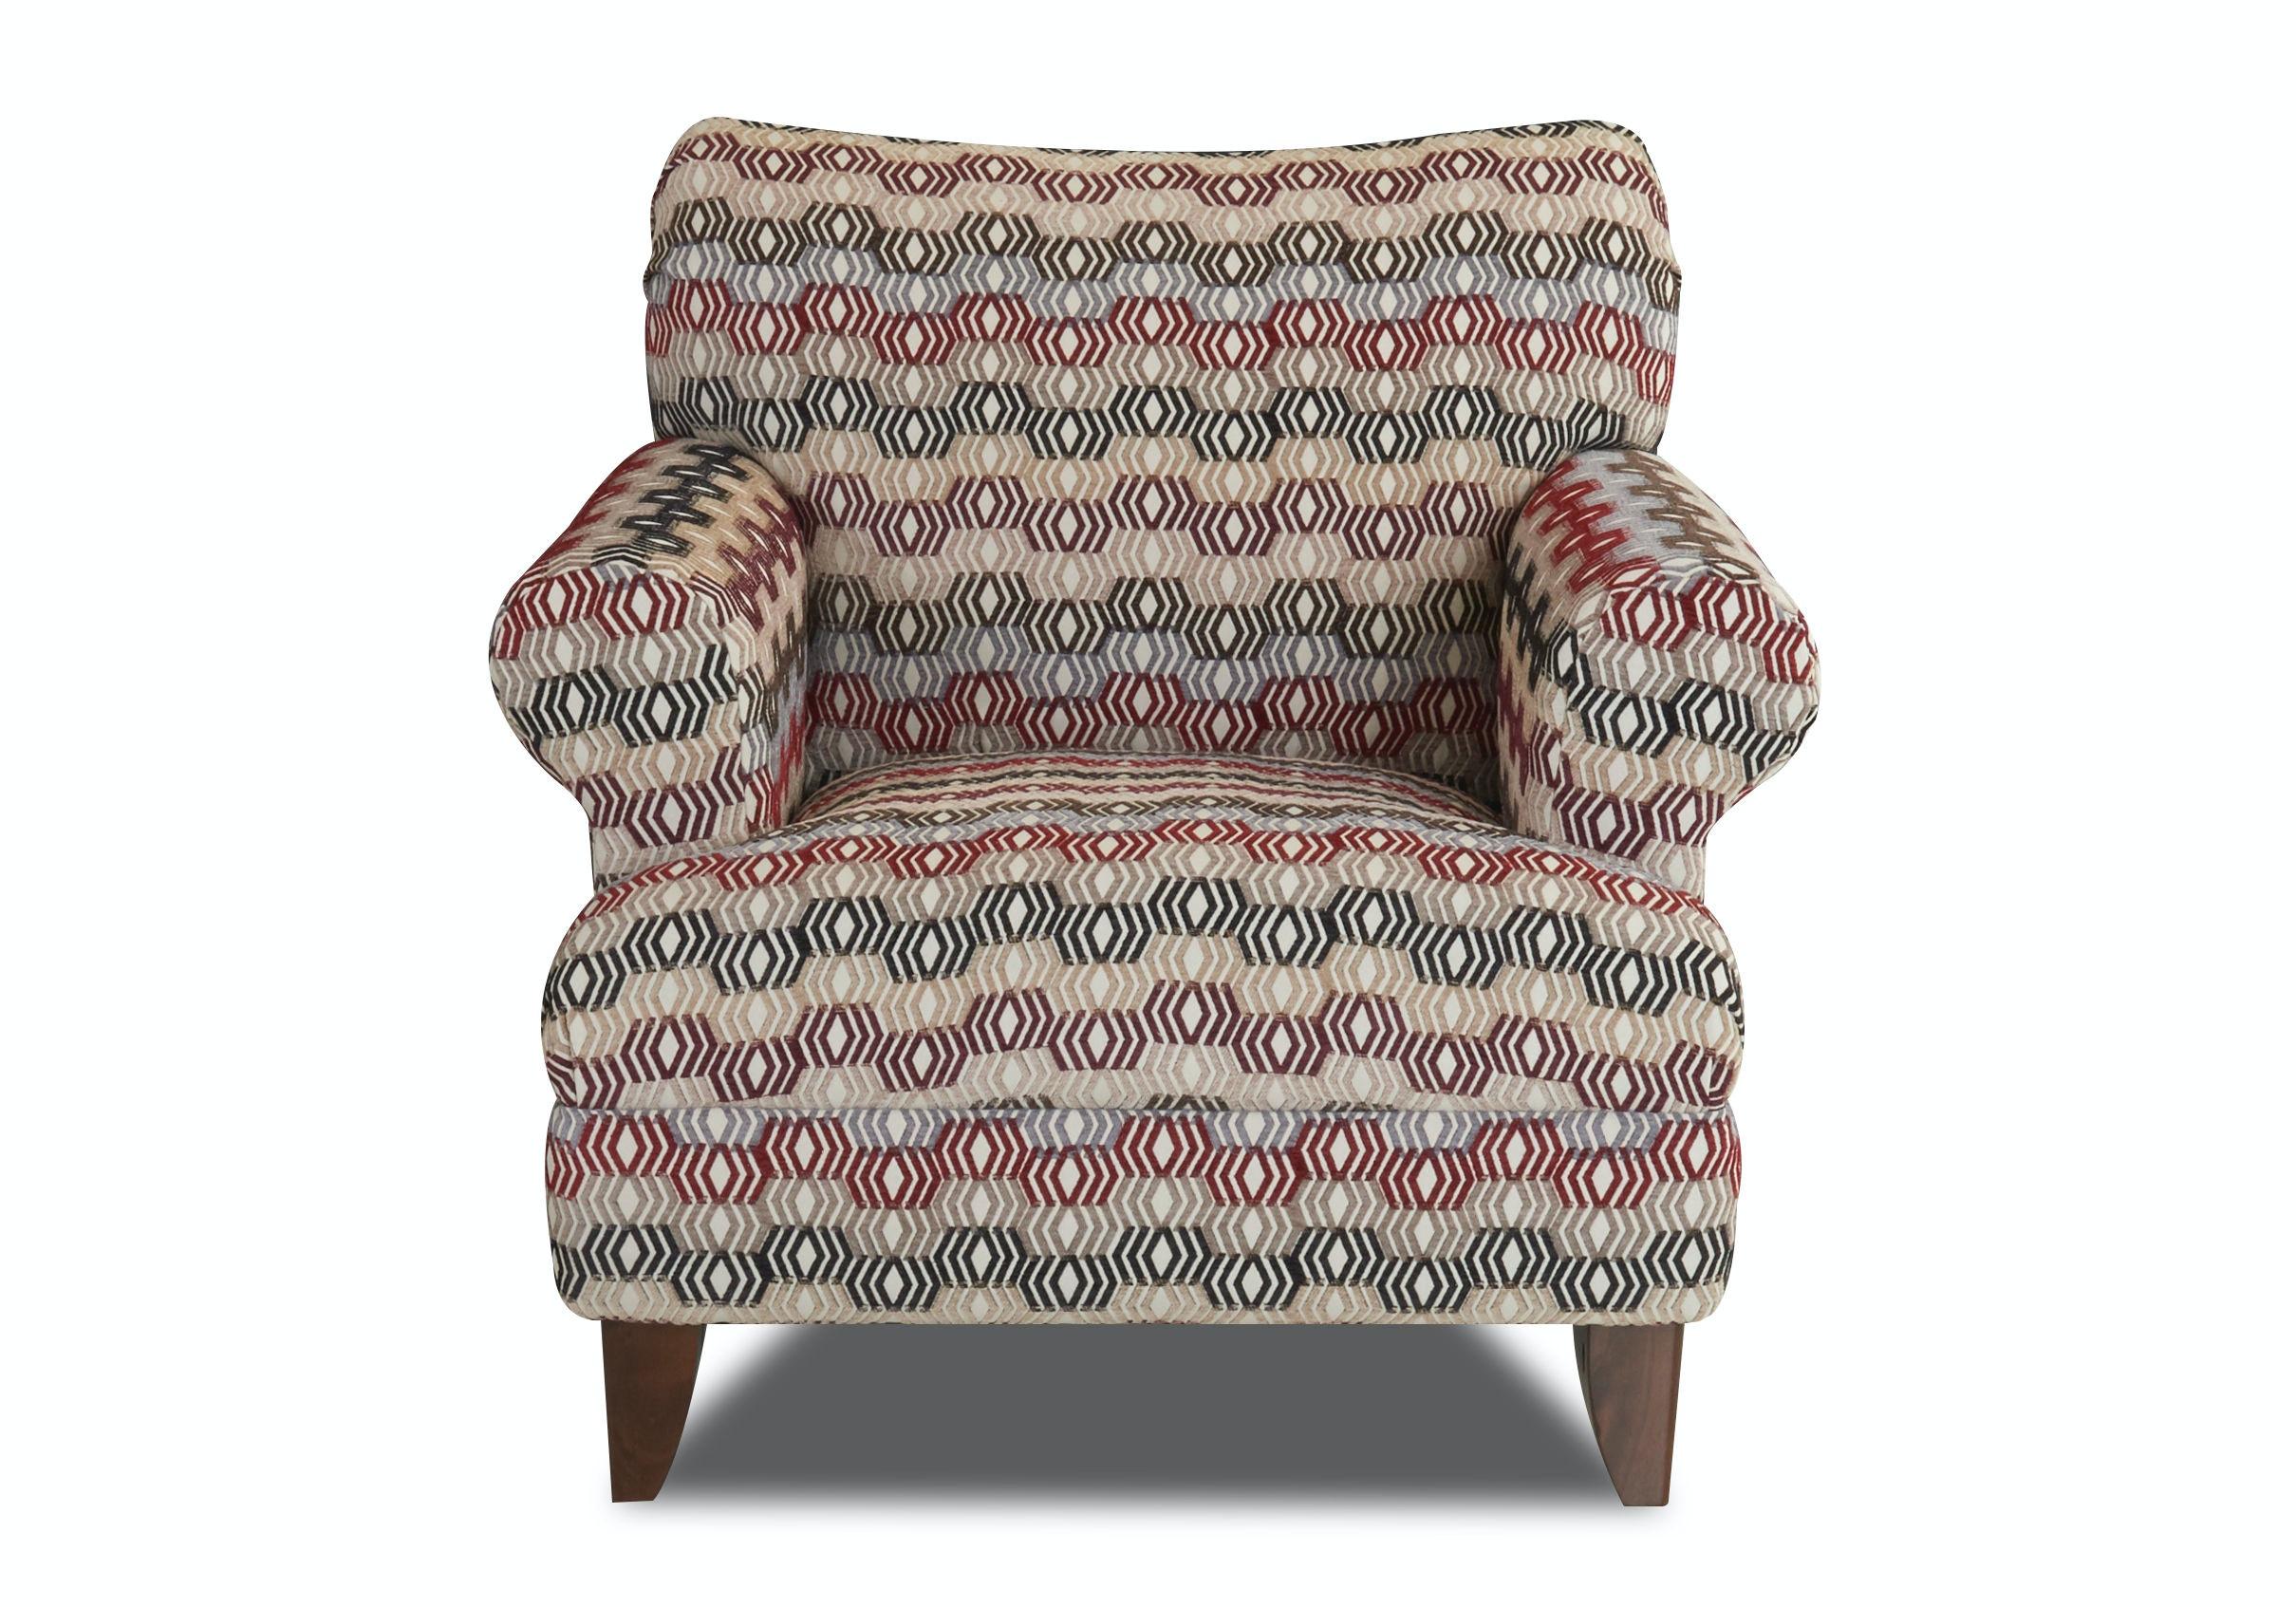 ... Chair 280 C - Klaussner Homestore of Raleigh - KSC - Raleigh, NC